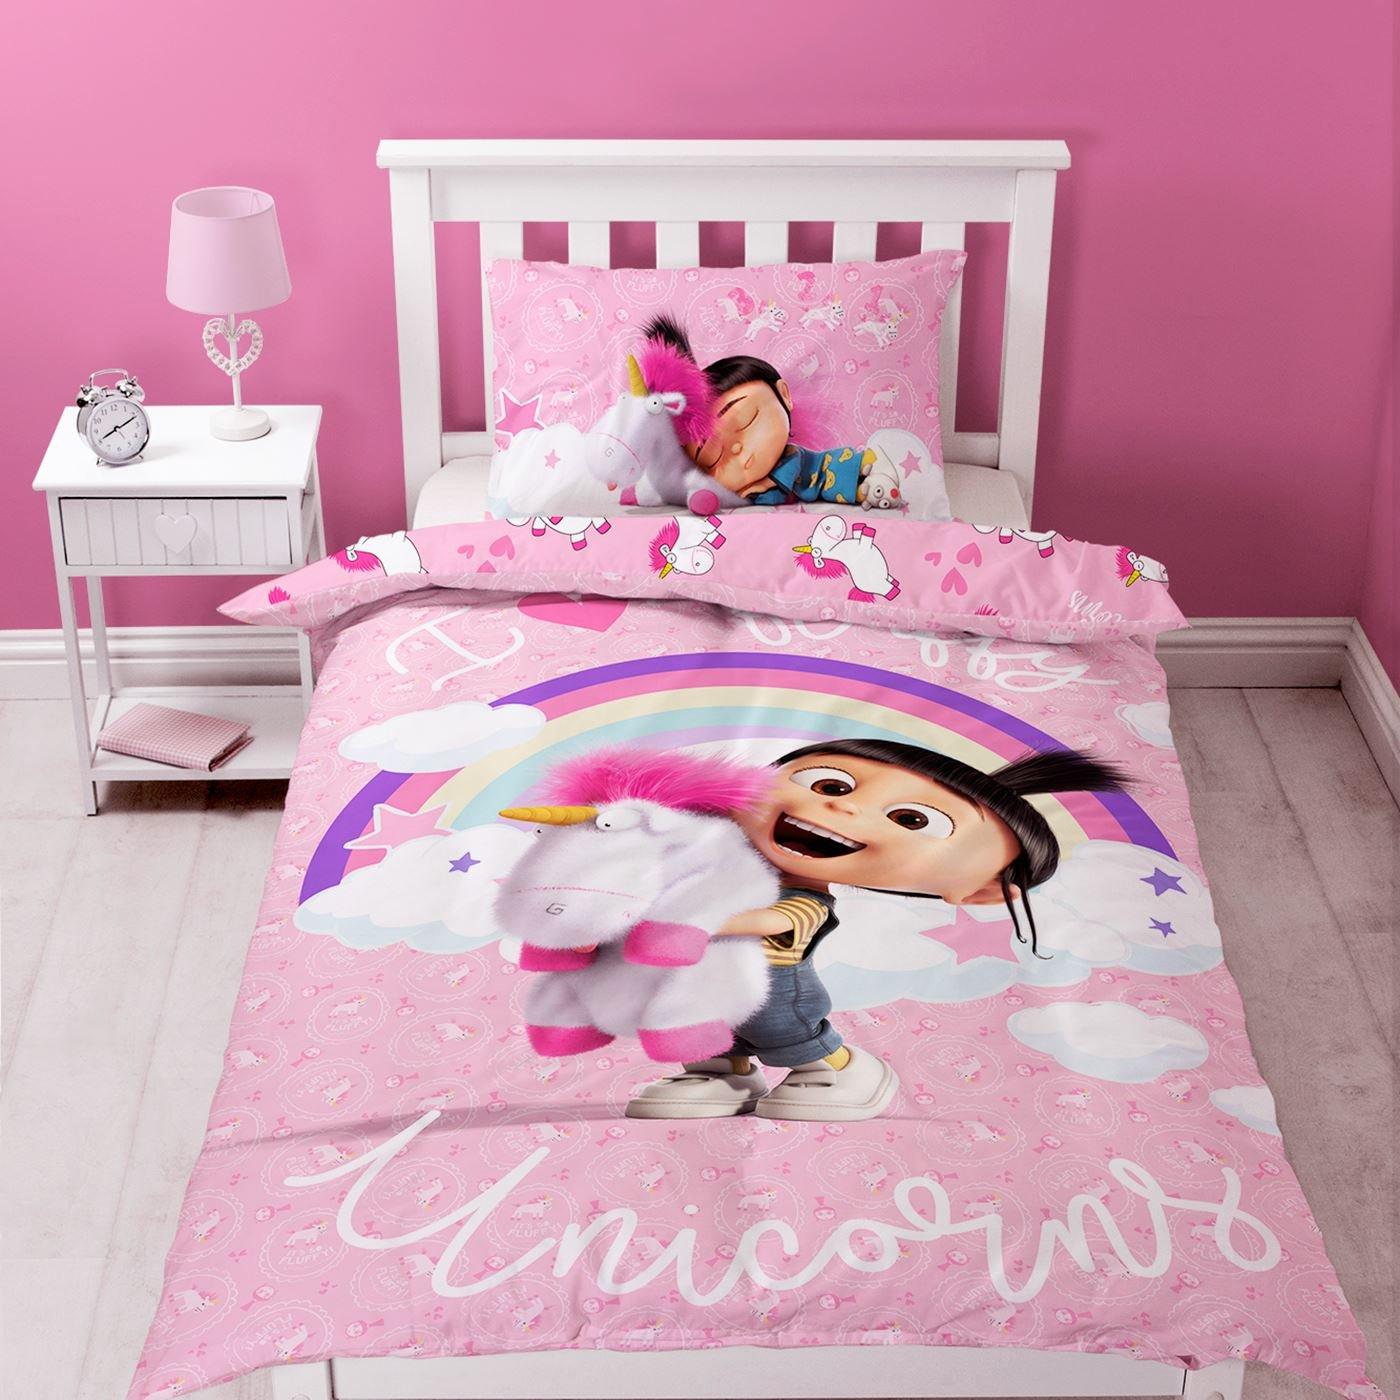 Despicable Me Duvet Set, Polyester-Cotton, Pink, Single Character World UDMDDMDS001UK1